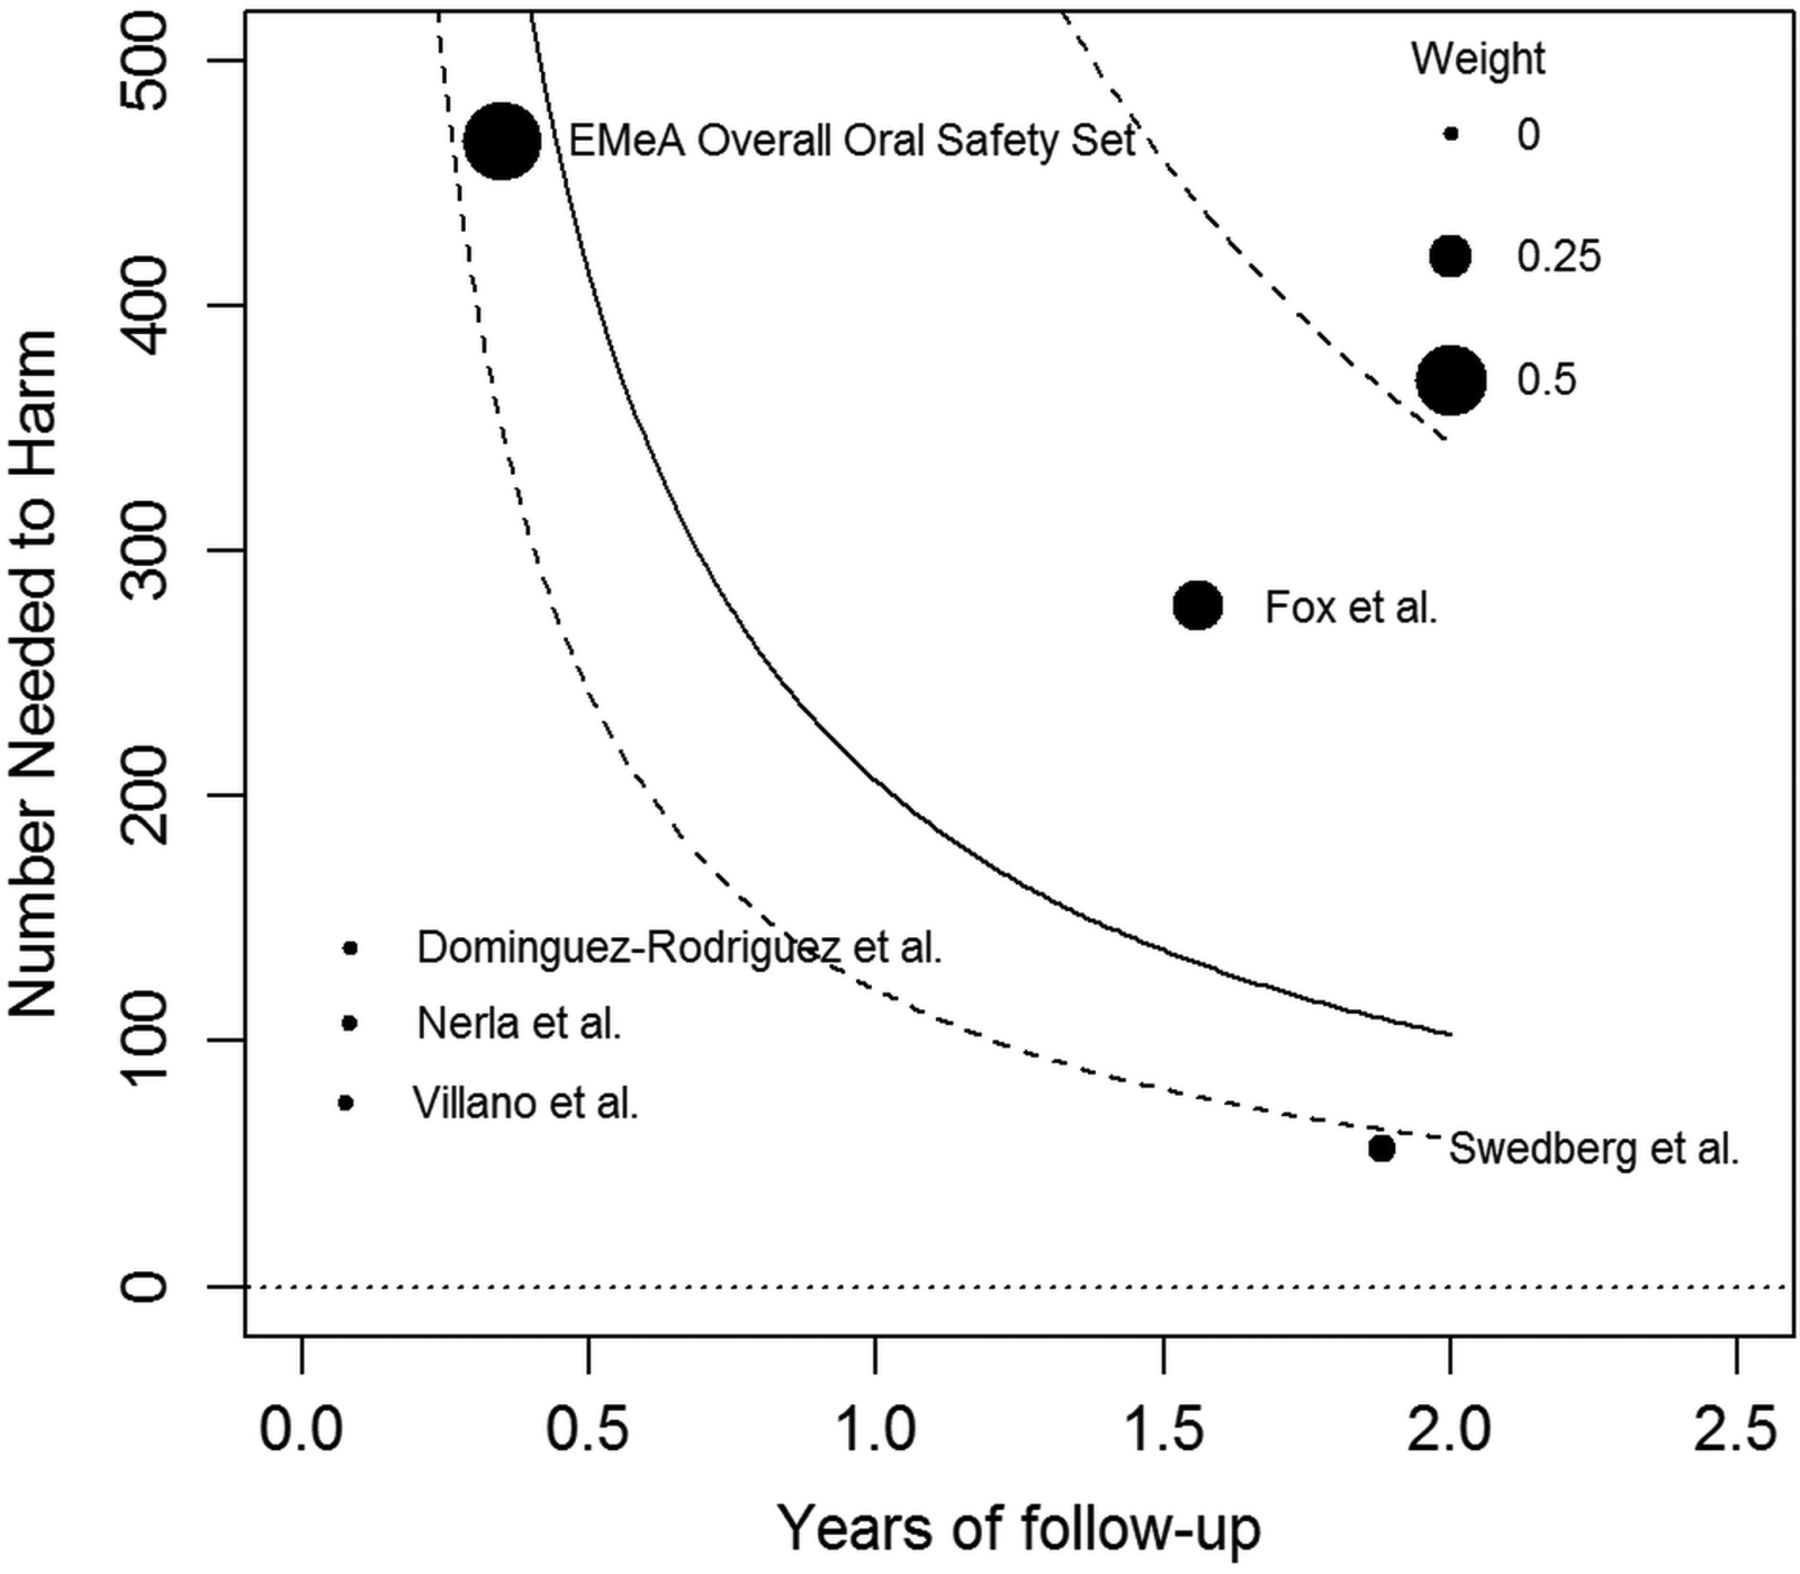 Atrial fibrillation associated with ivabradine treatment